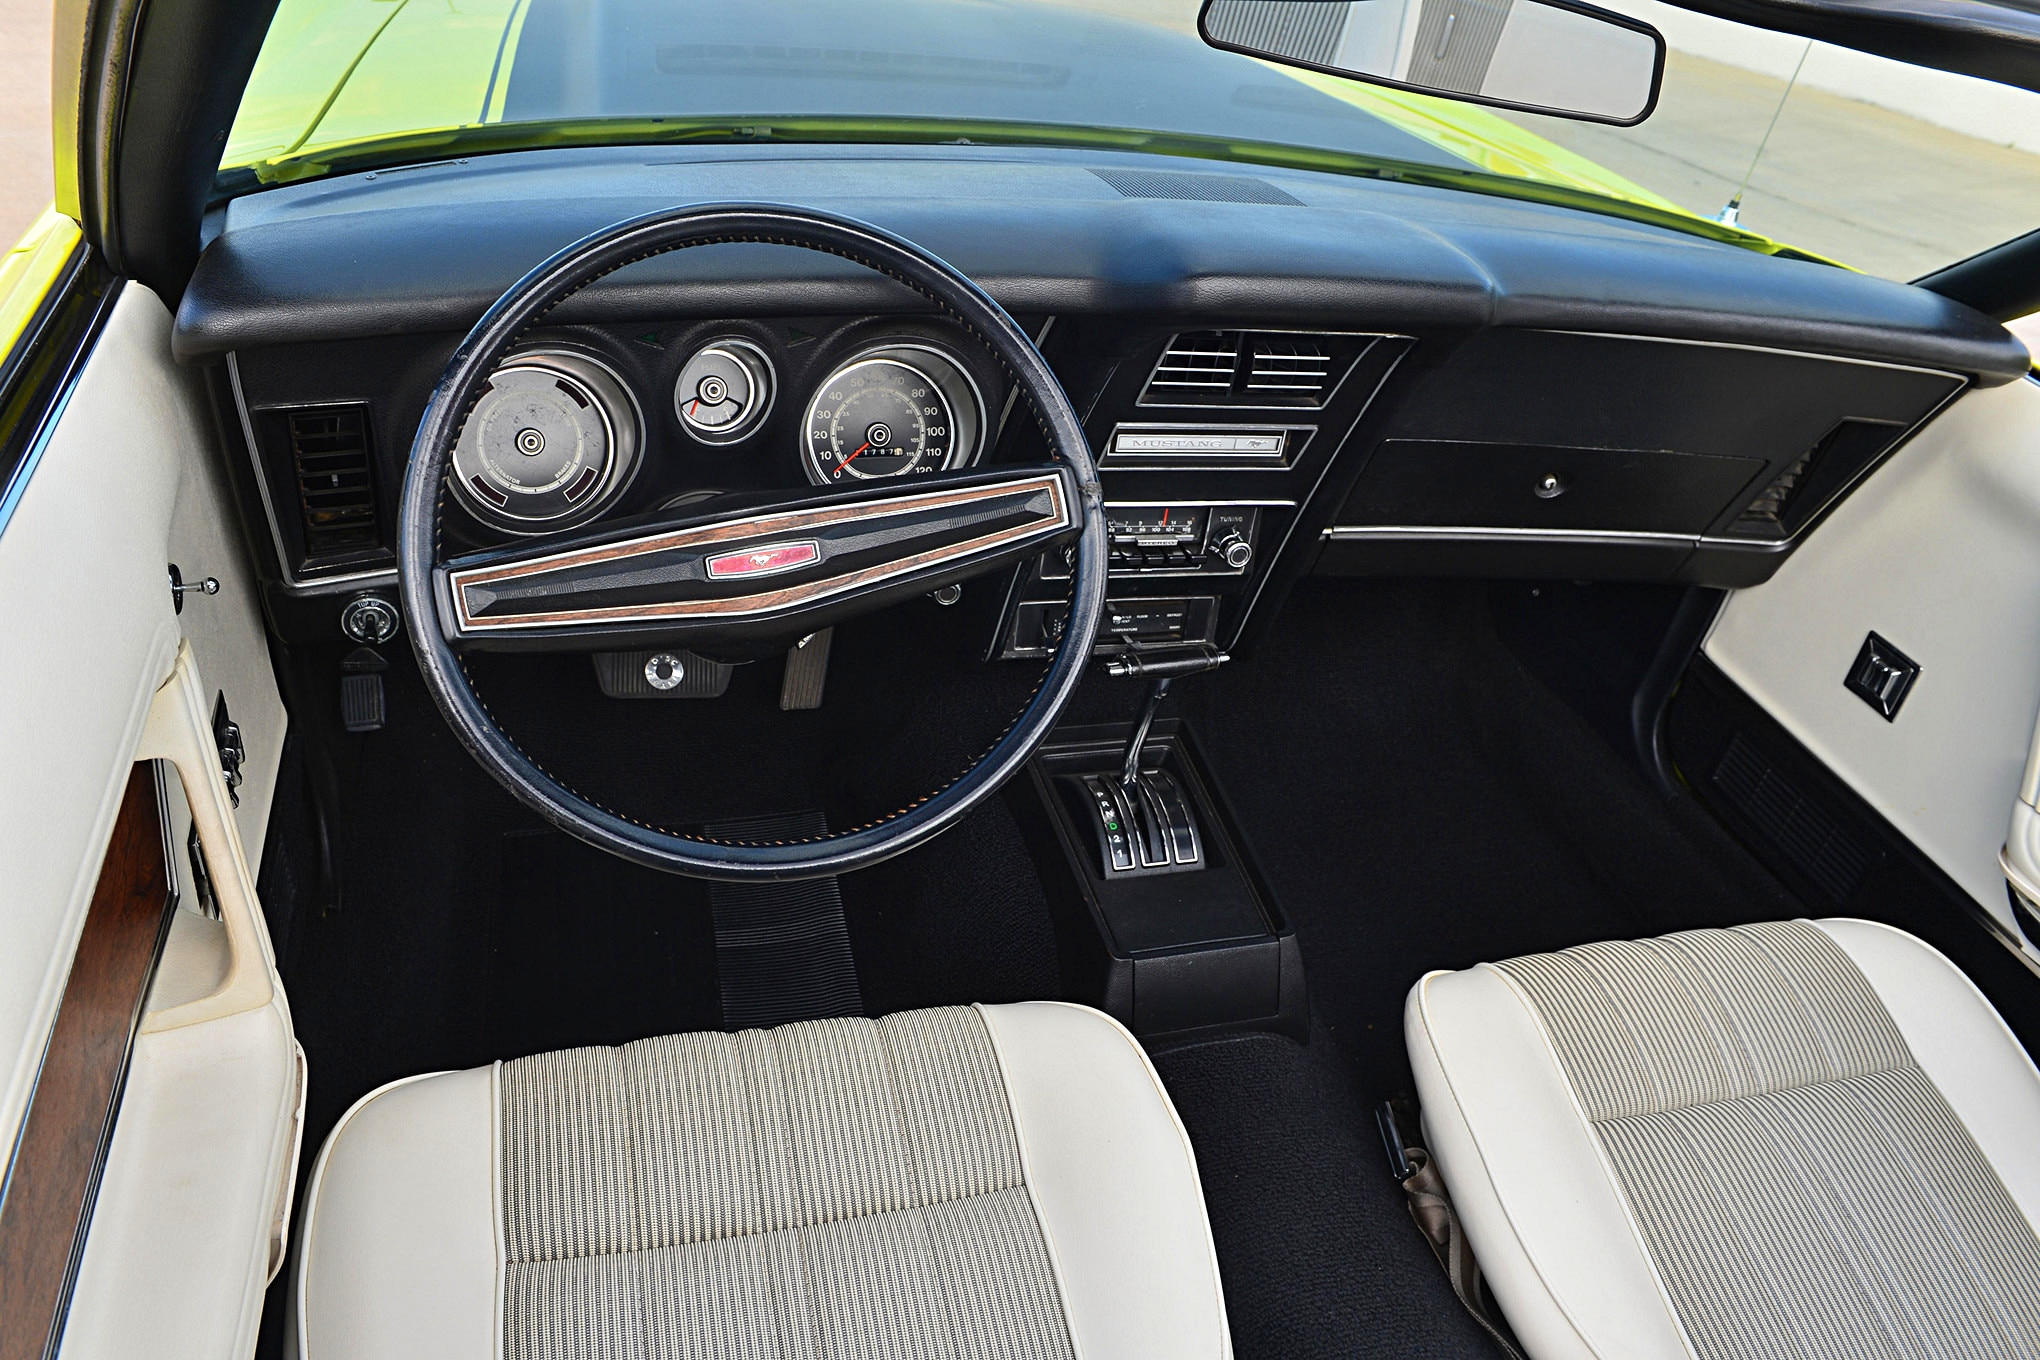 032 1971 73 Mustang SpottersGuide Heasley